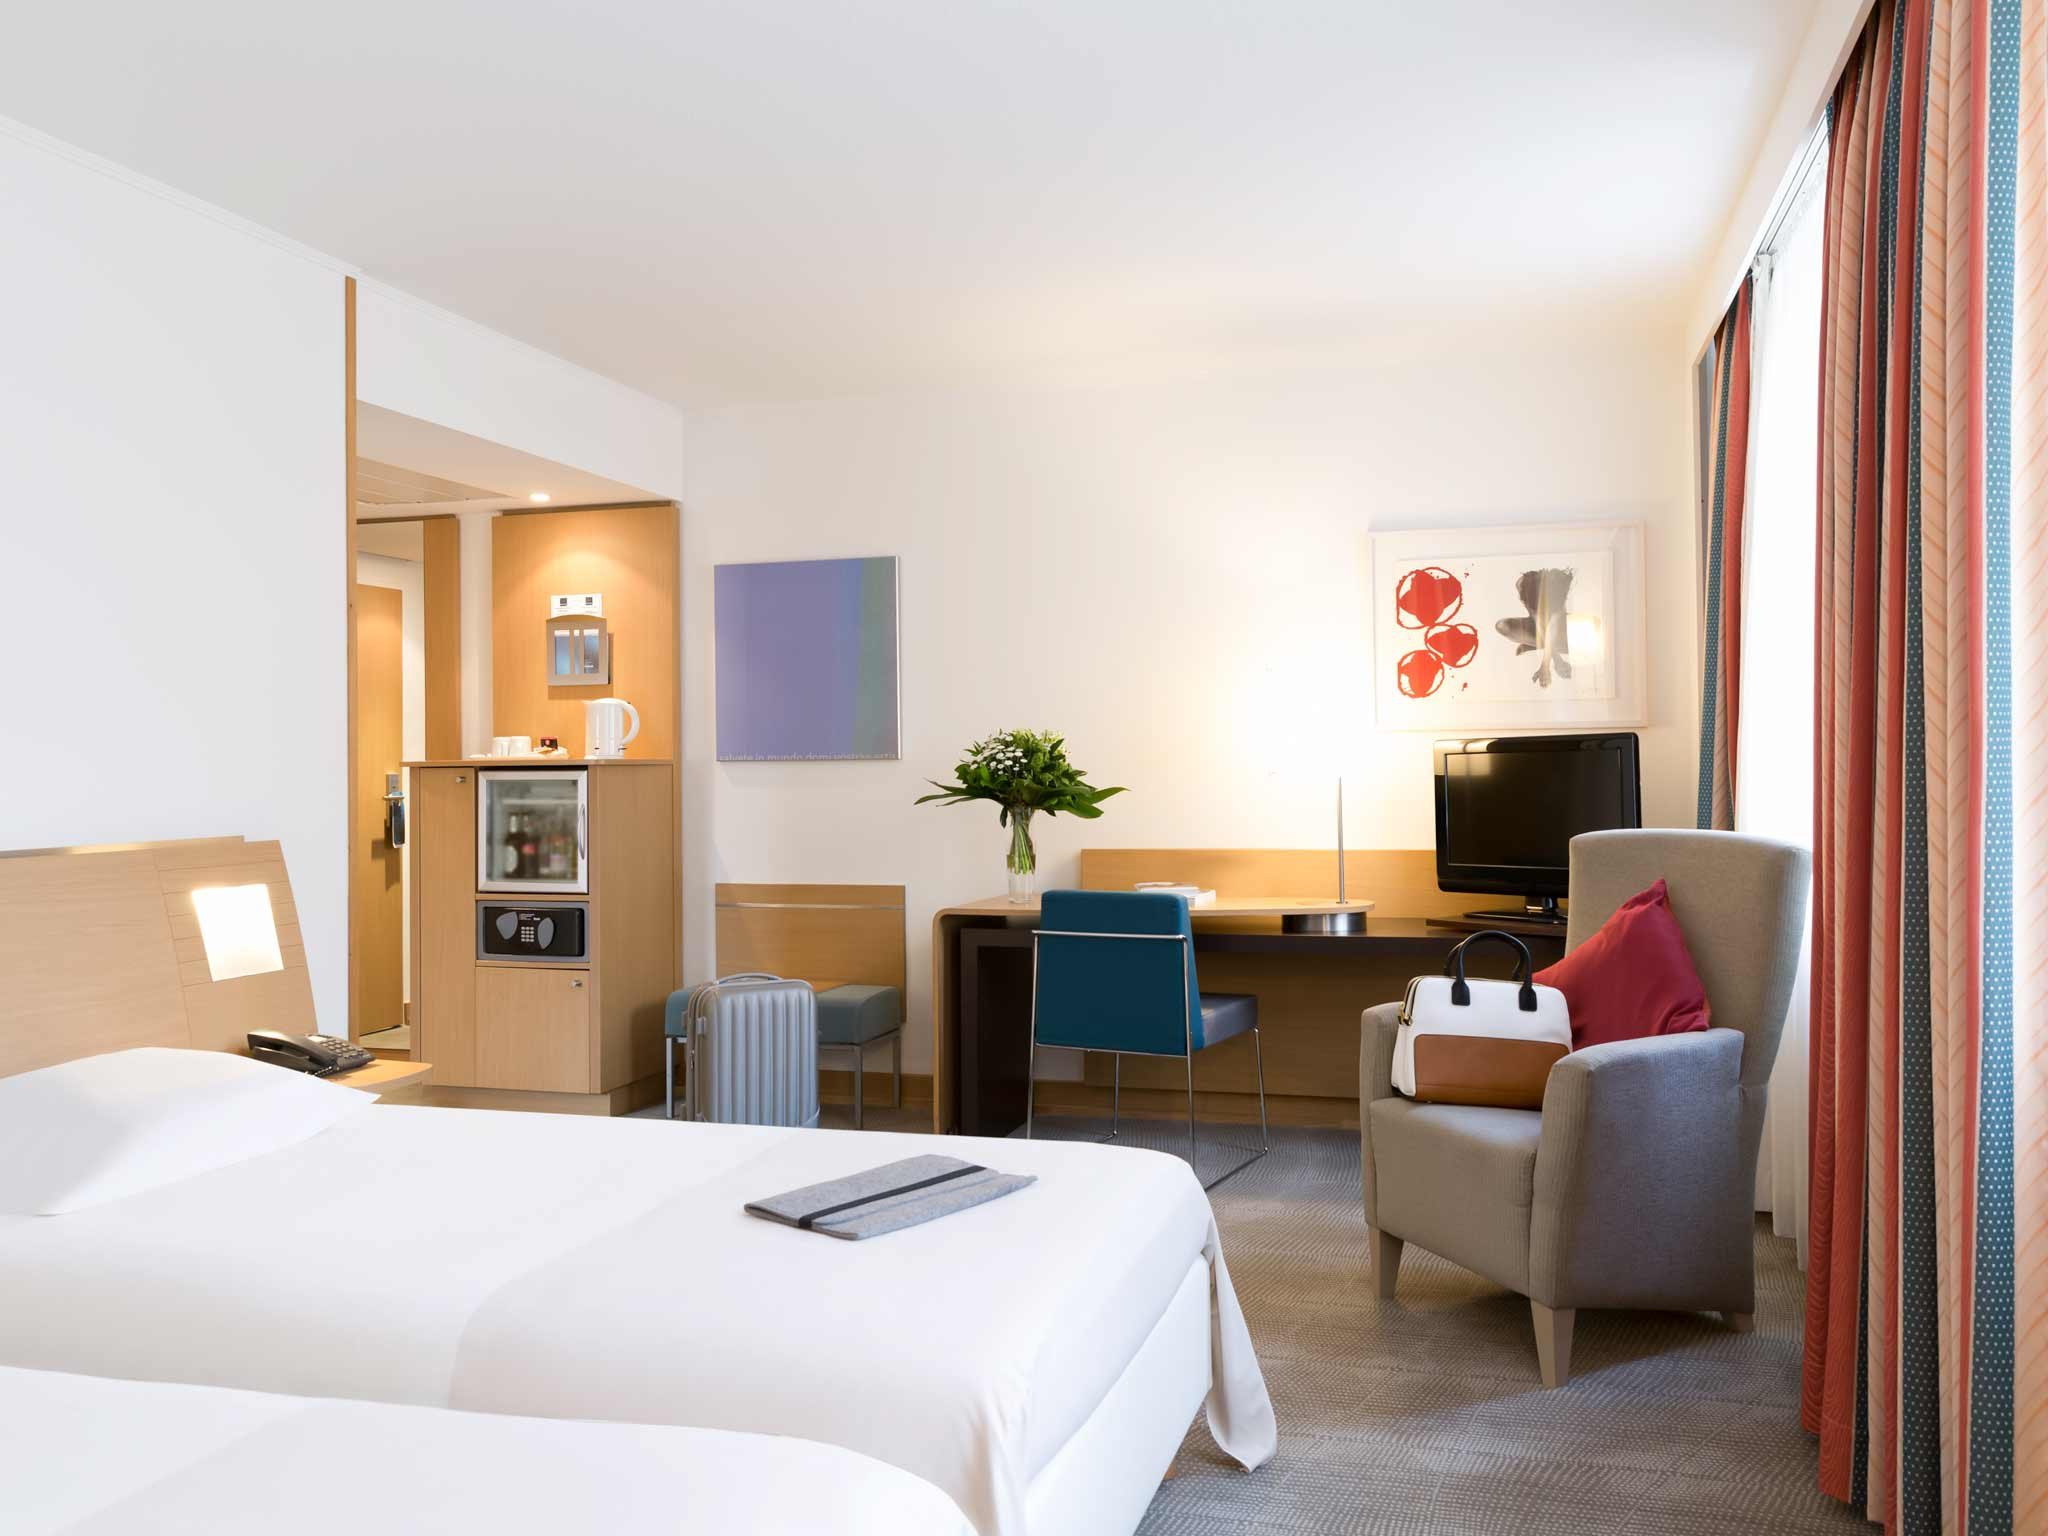 Hotel Novotel Wuerzburg Rooms